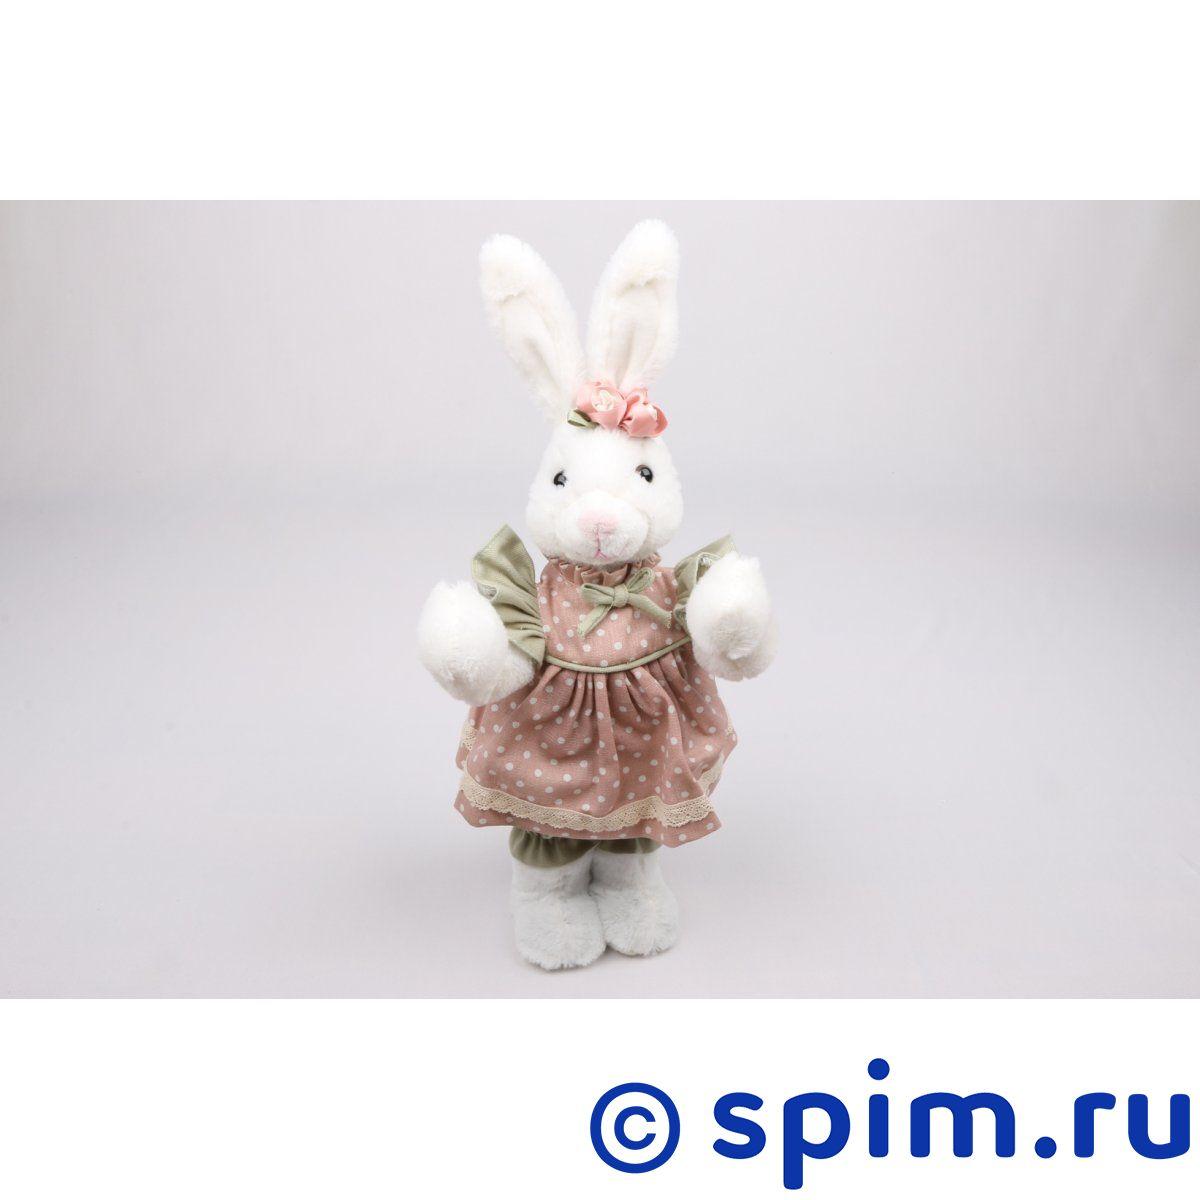 Интерьерная кукла Зайчишка C21-168329